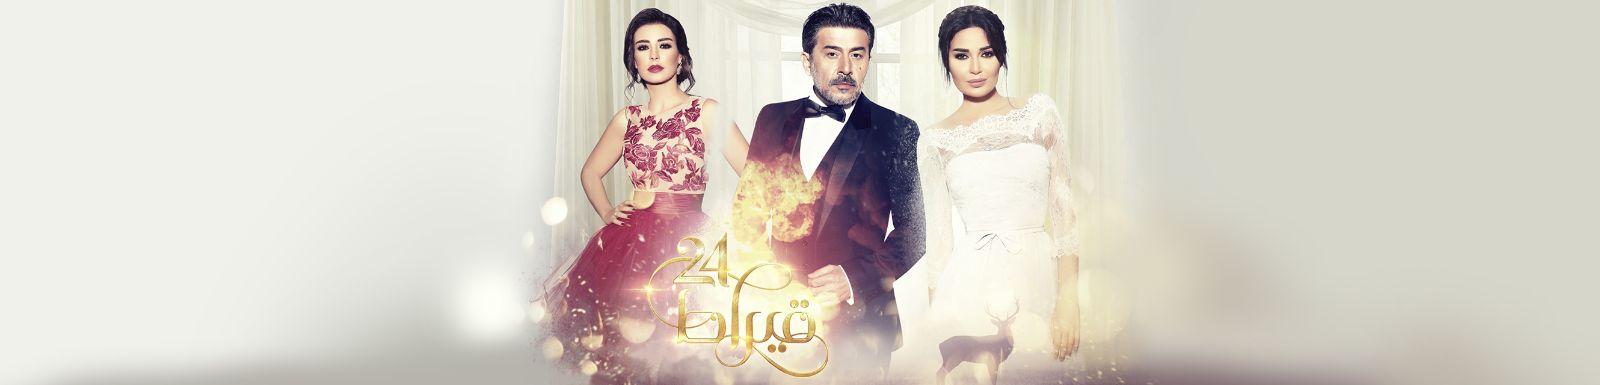 ����� ����� 24 ����� ������ 25 MBC shahid ���� ��